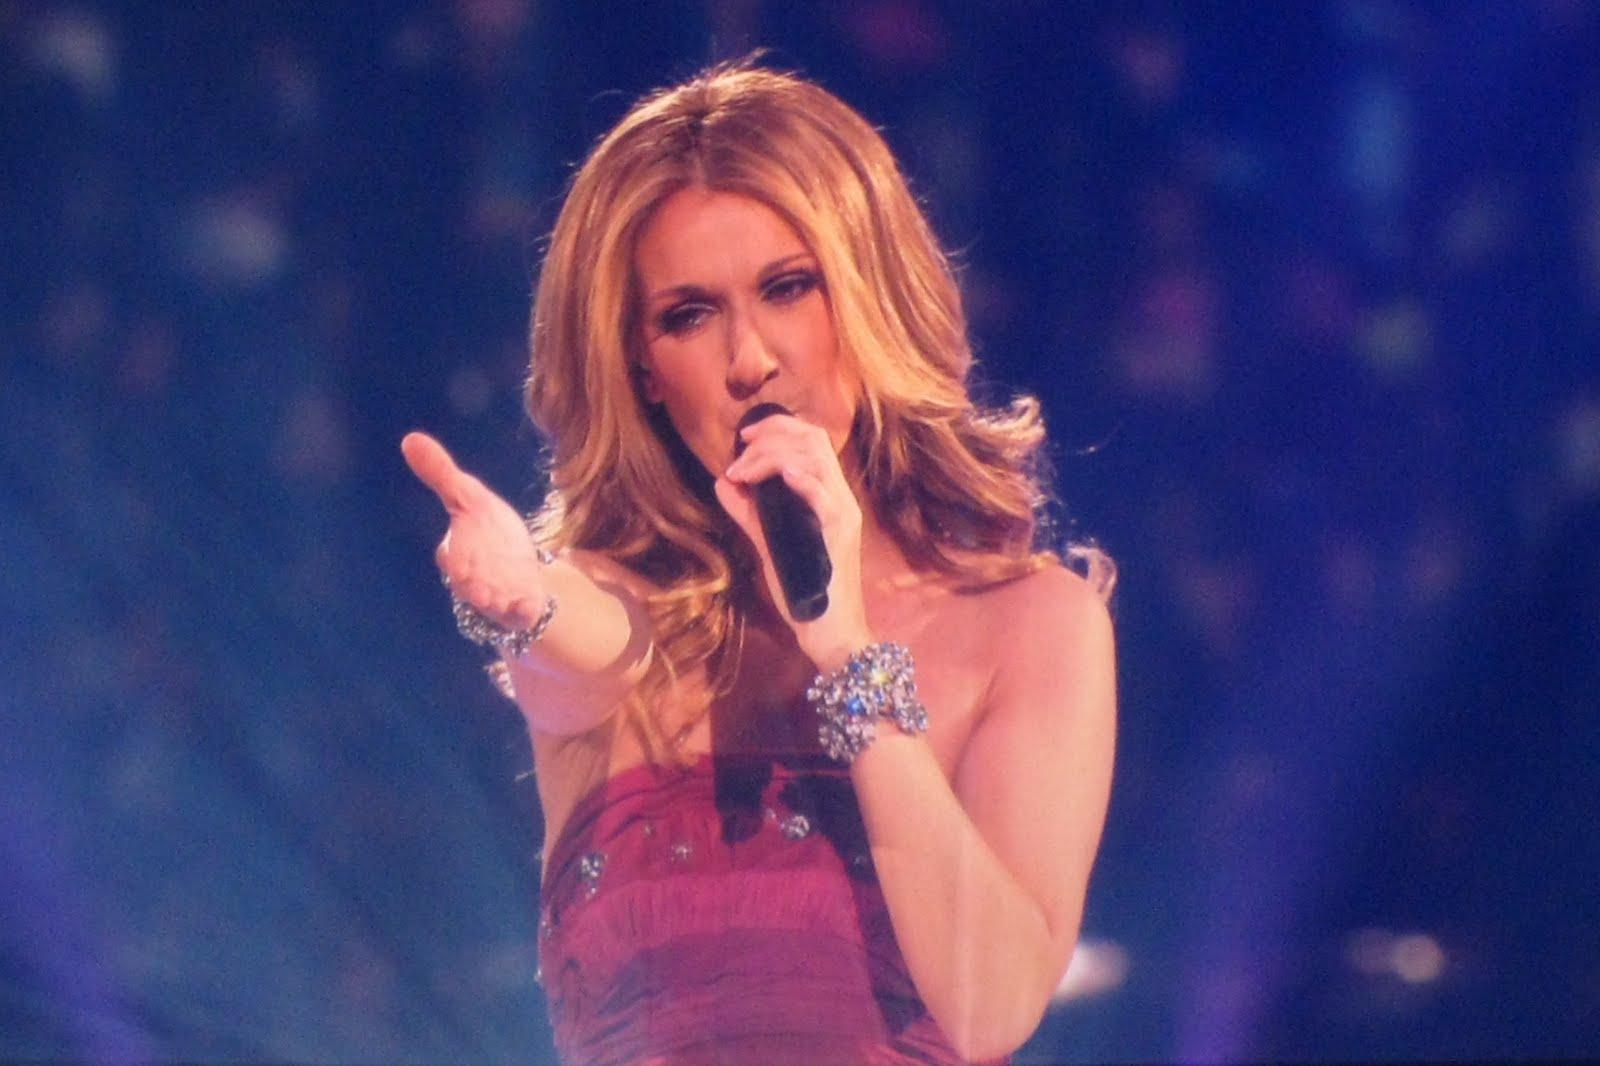 http://2.bp.blogspot.com/_Bjq8PhrKfnA/TCa_dPcVMVI/AAAAAAAACp0/ogysCb2CmgQ/s1600/20090506010251!Celine_Dion_Concert_Singing_%27Taking_Chances%27_2008.jpg